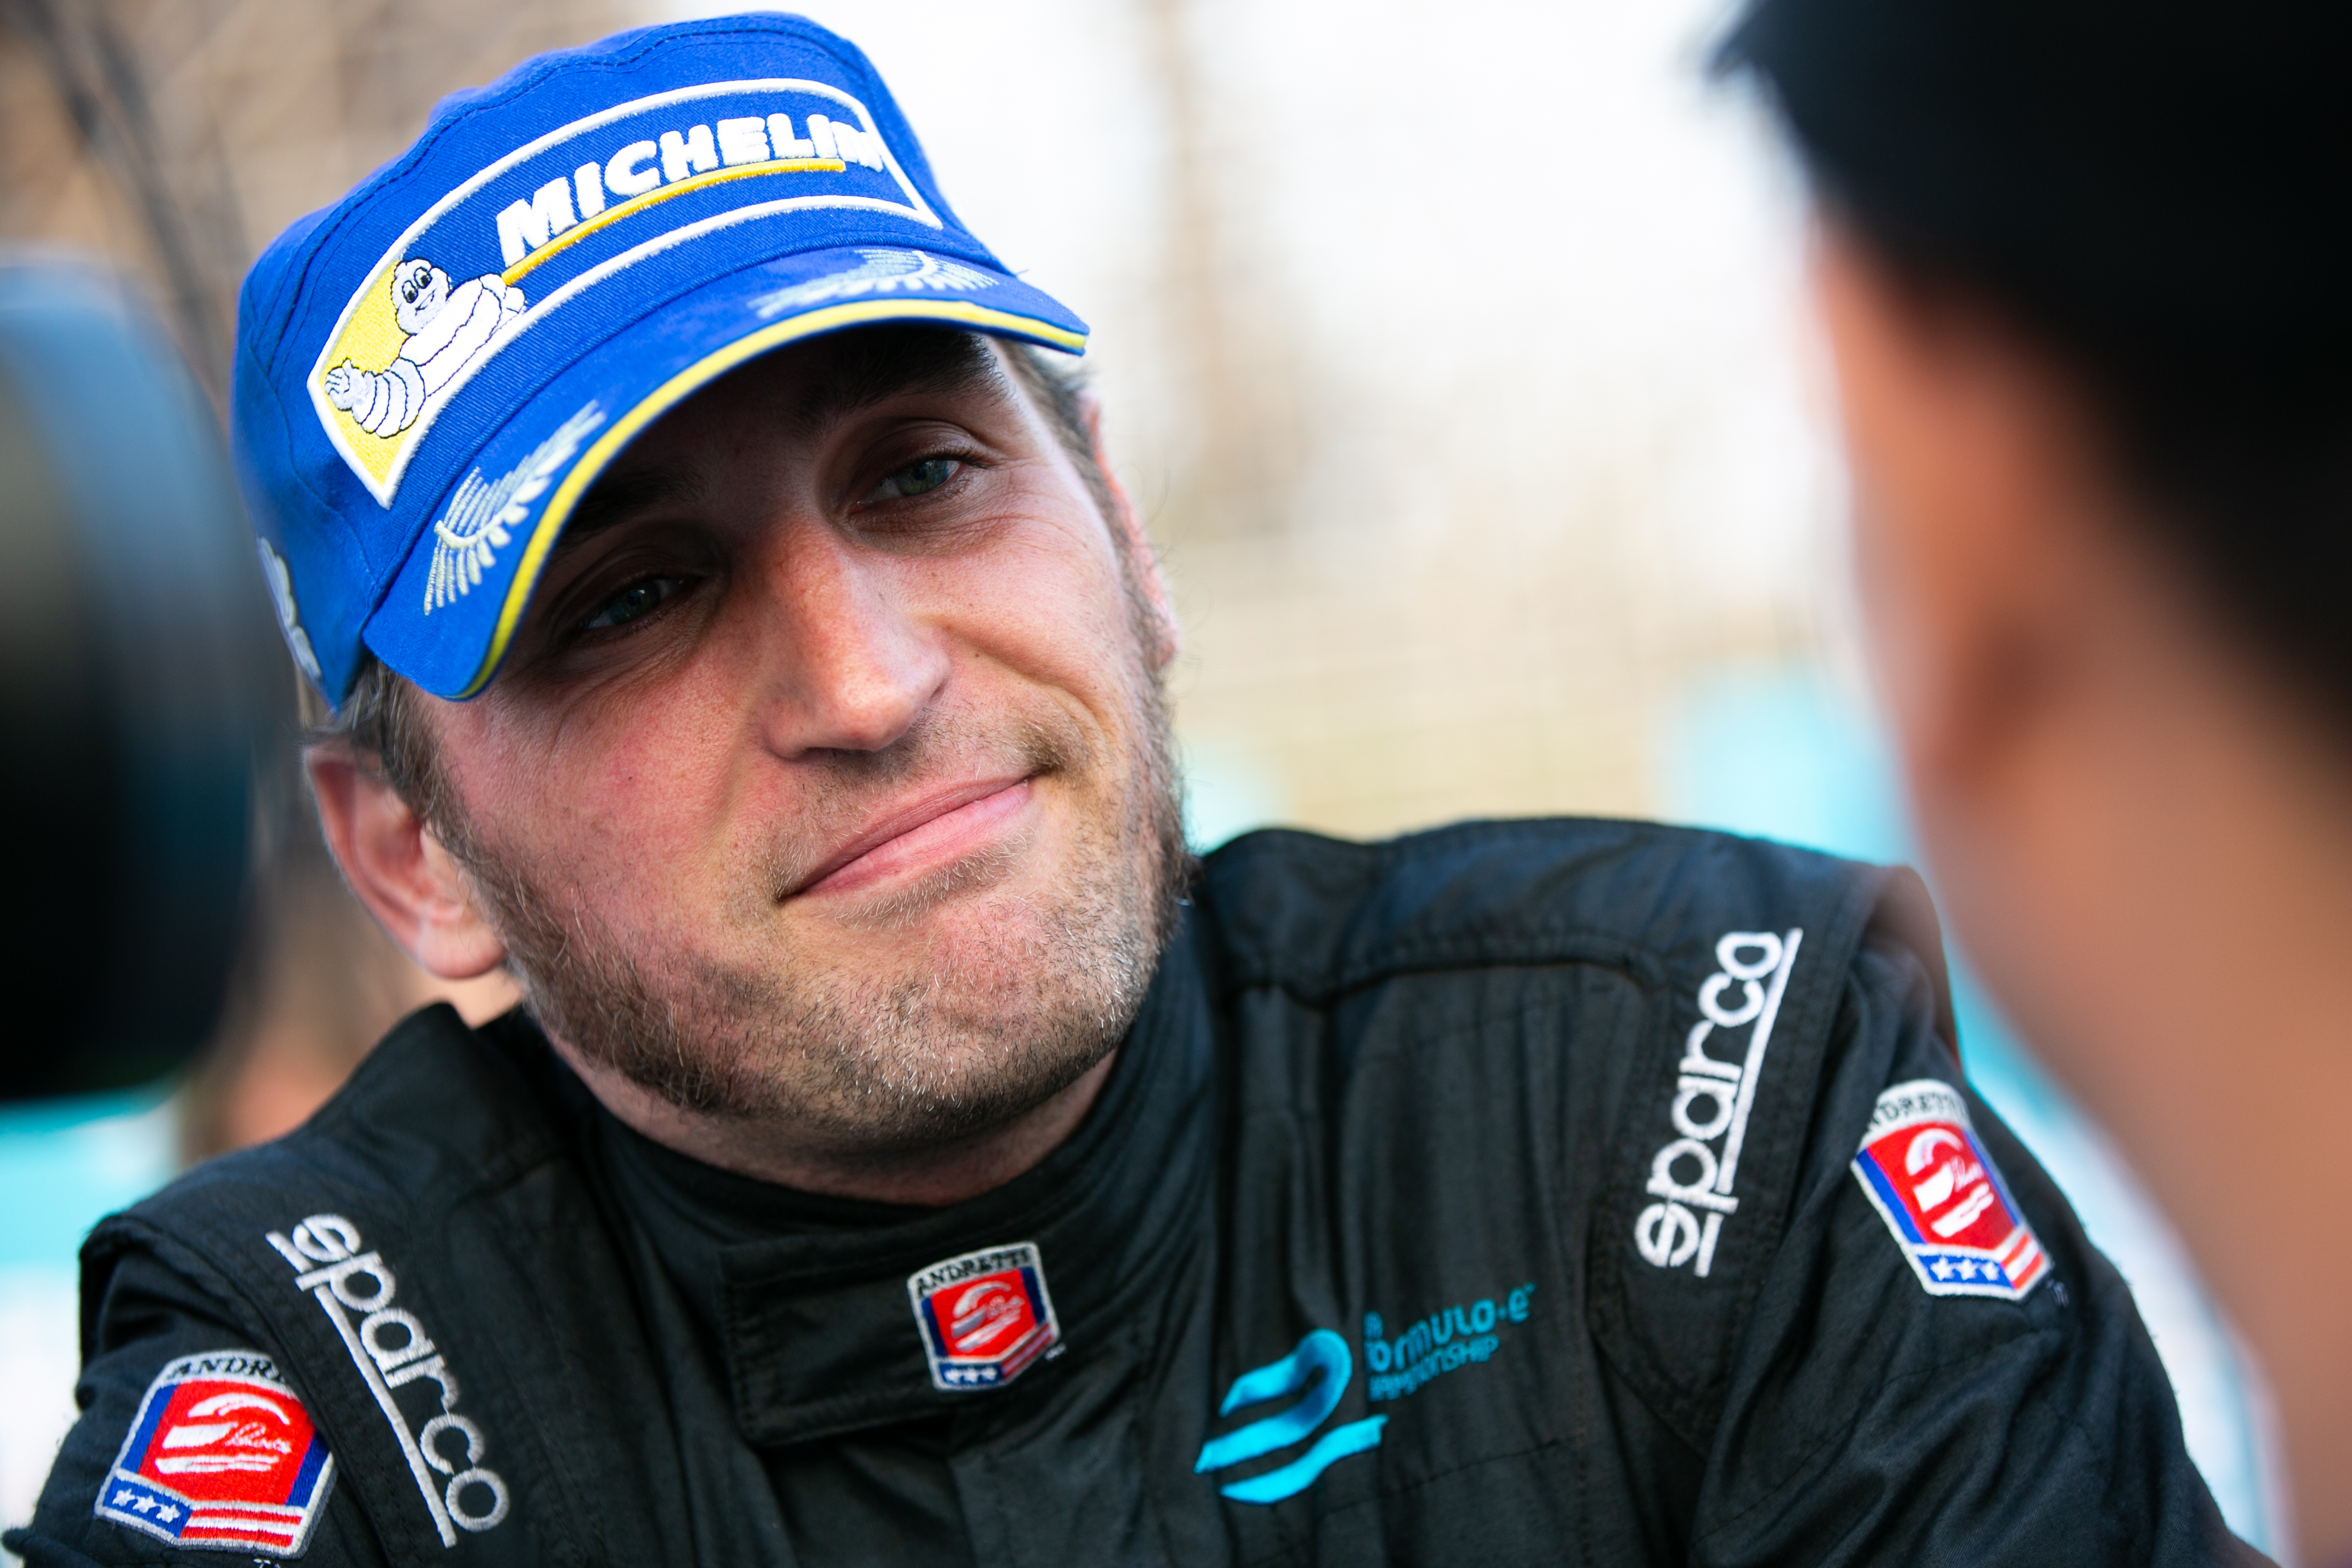 Franck Montagny Andretti Autosport 2014